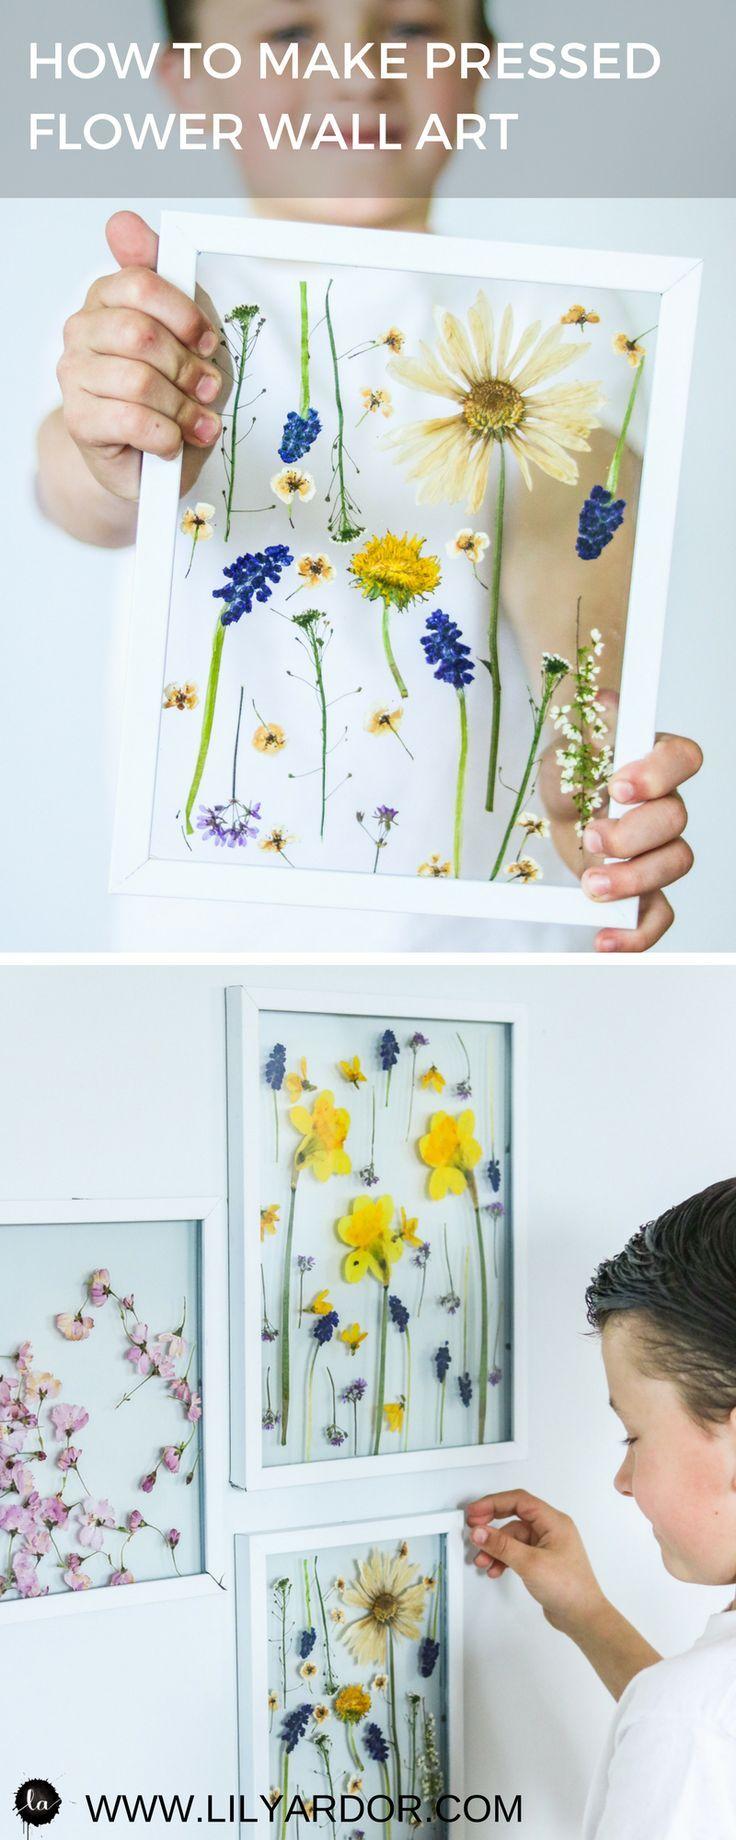 Garden wall art flowers  Motherus day craft ideas PRESS FLOWERS in  MINUTES   Garden